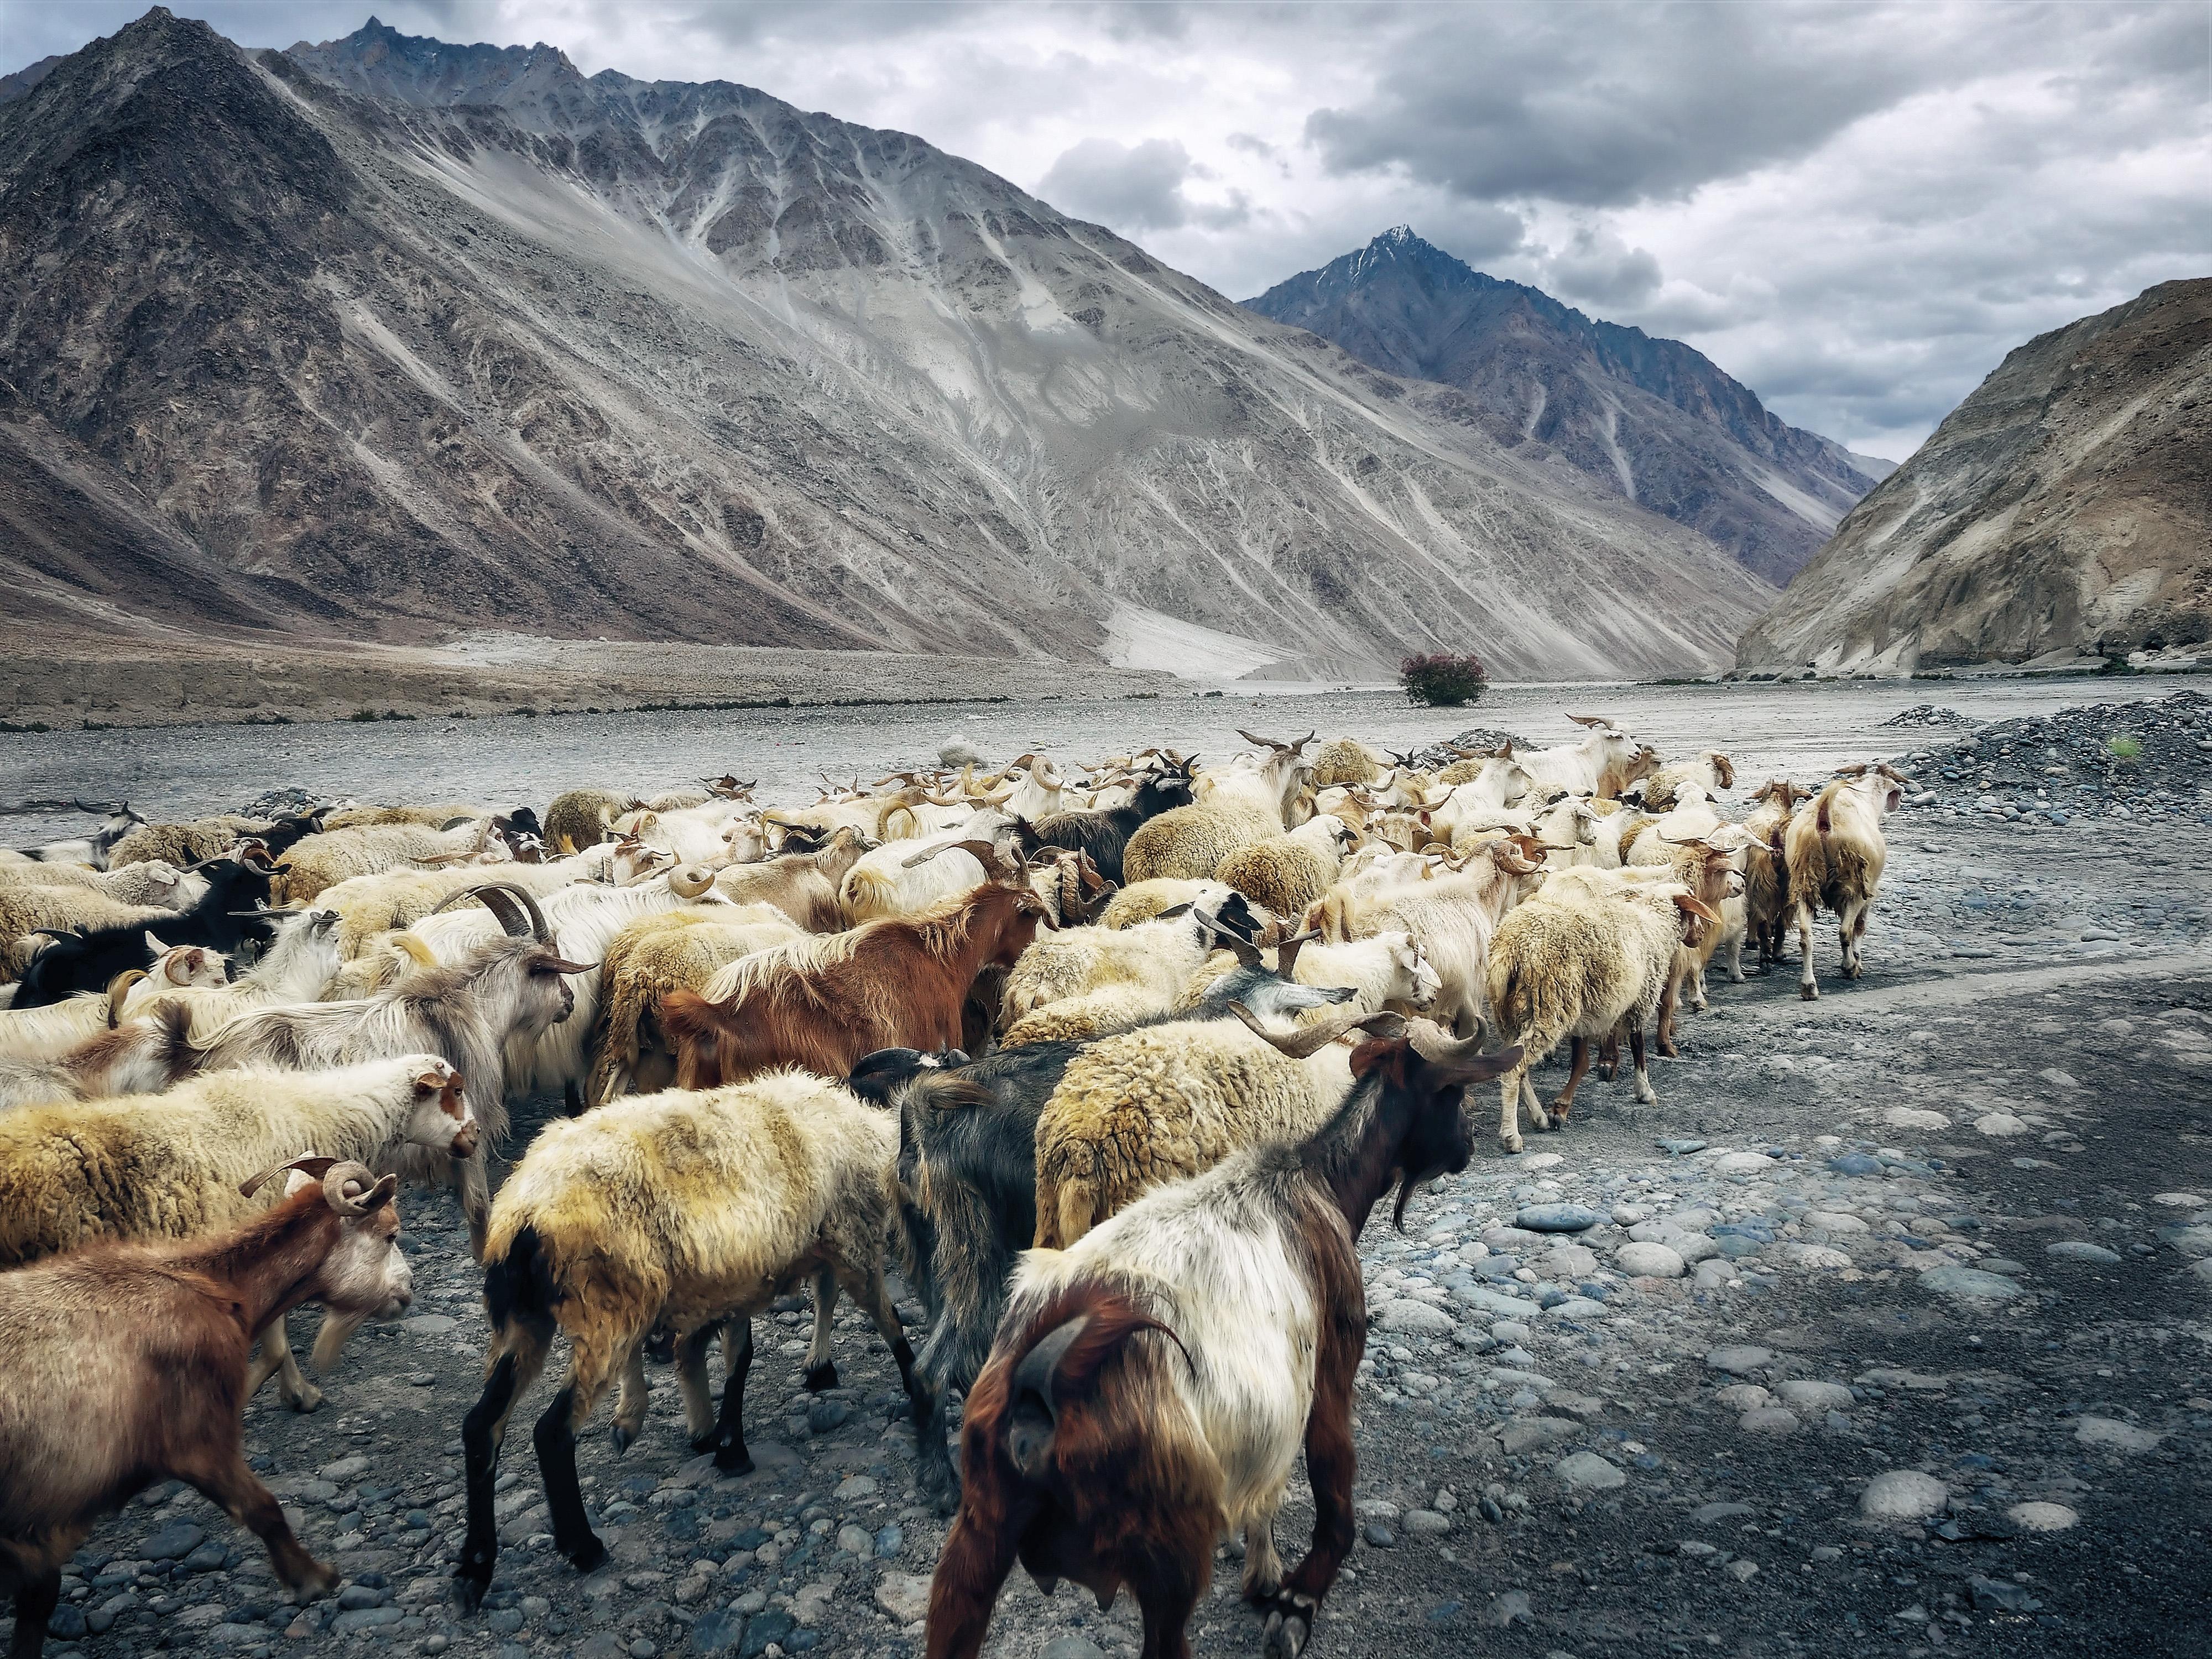 Mountainous herd photo